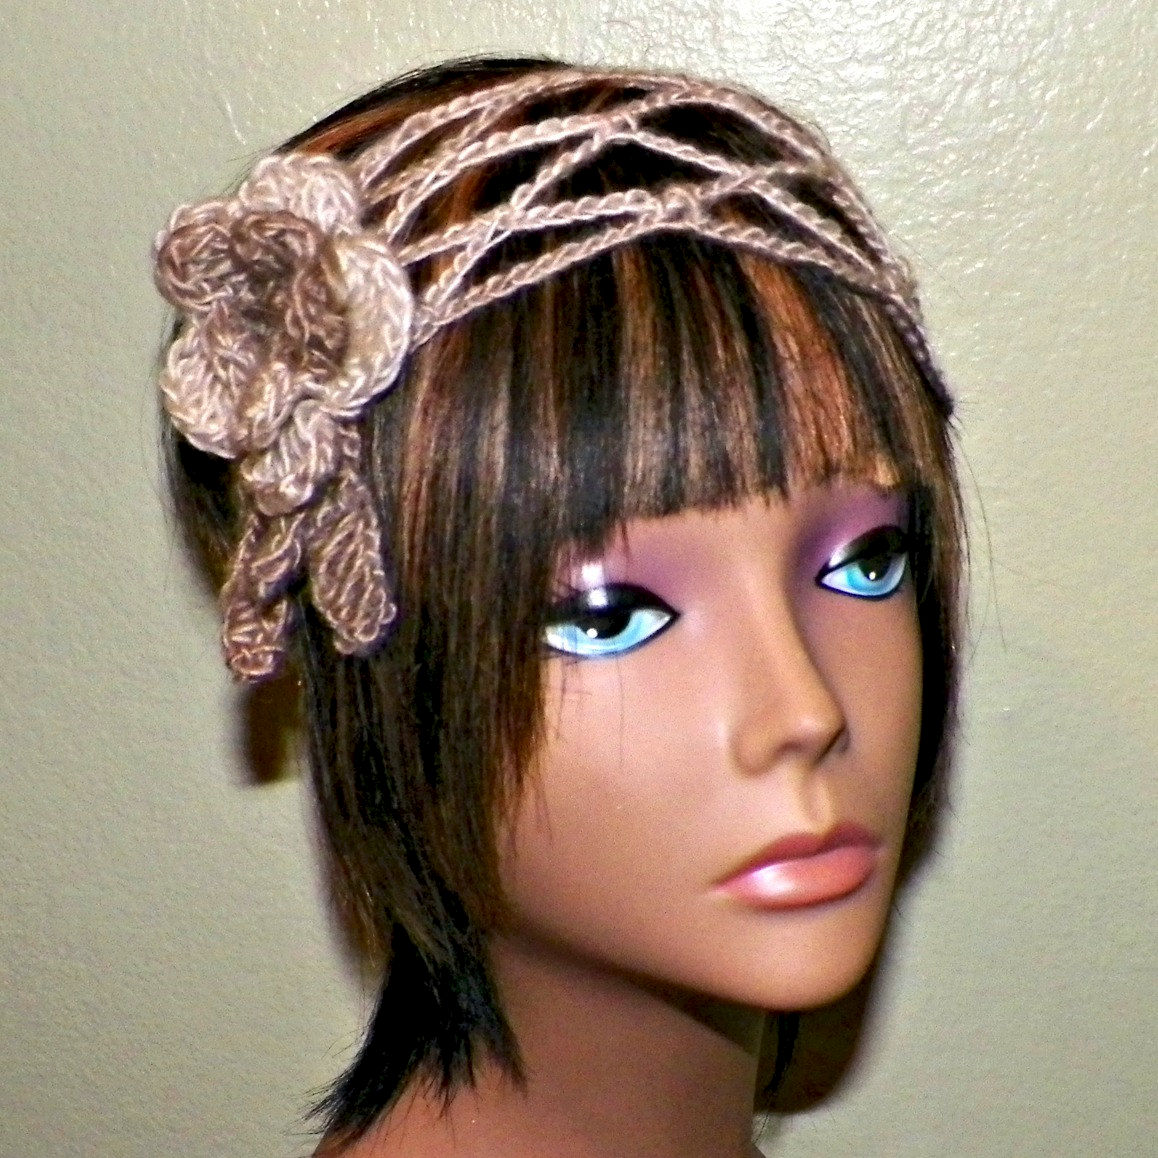 Flower Headband Mesh Hippie Boho Gypsy Earthtone Crochet Hair Band Adjustable Summer Lacy Womens With Irish Rose